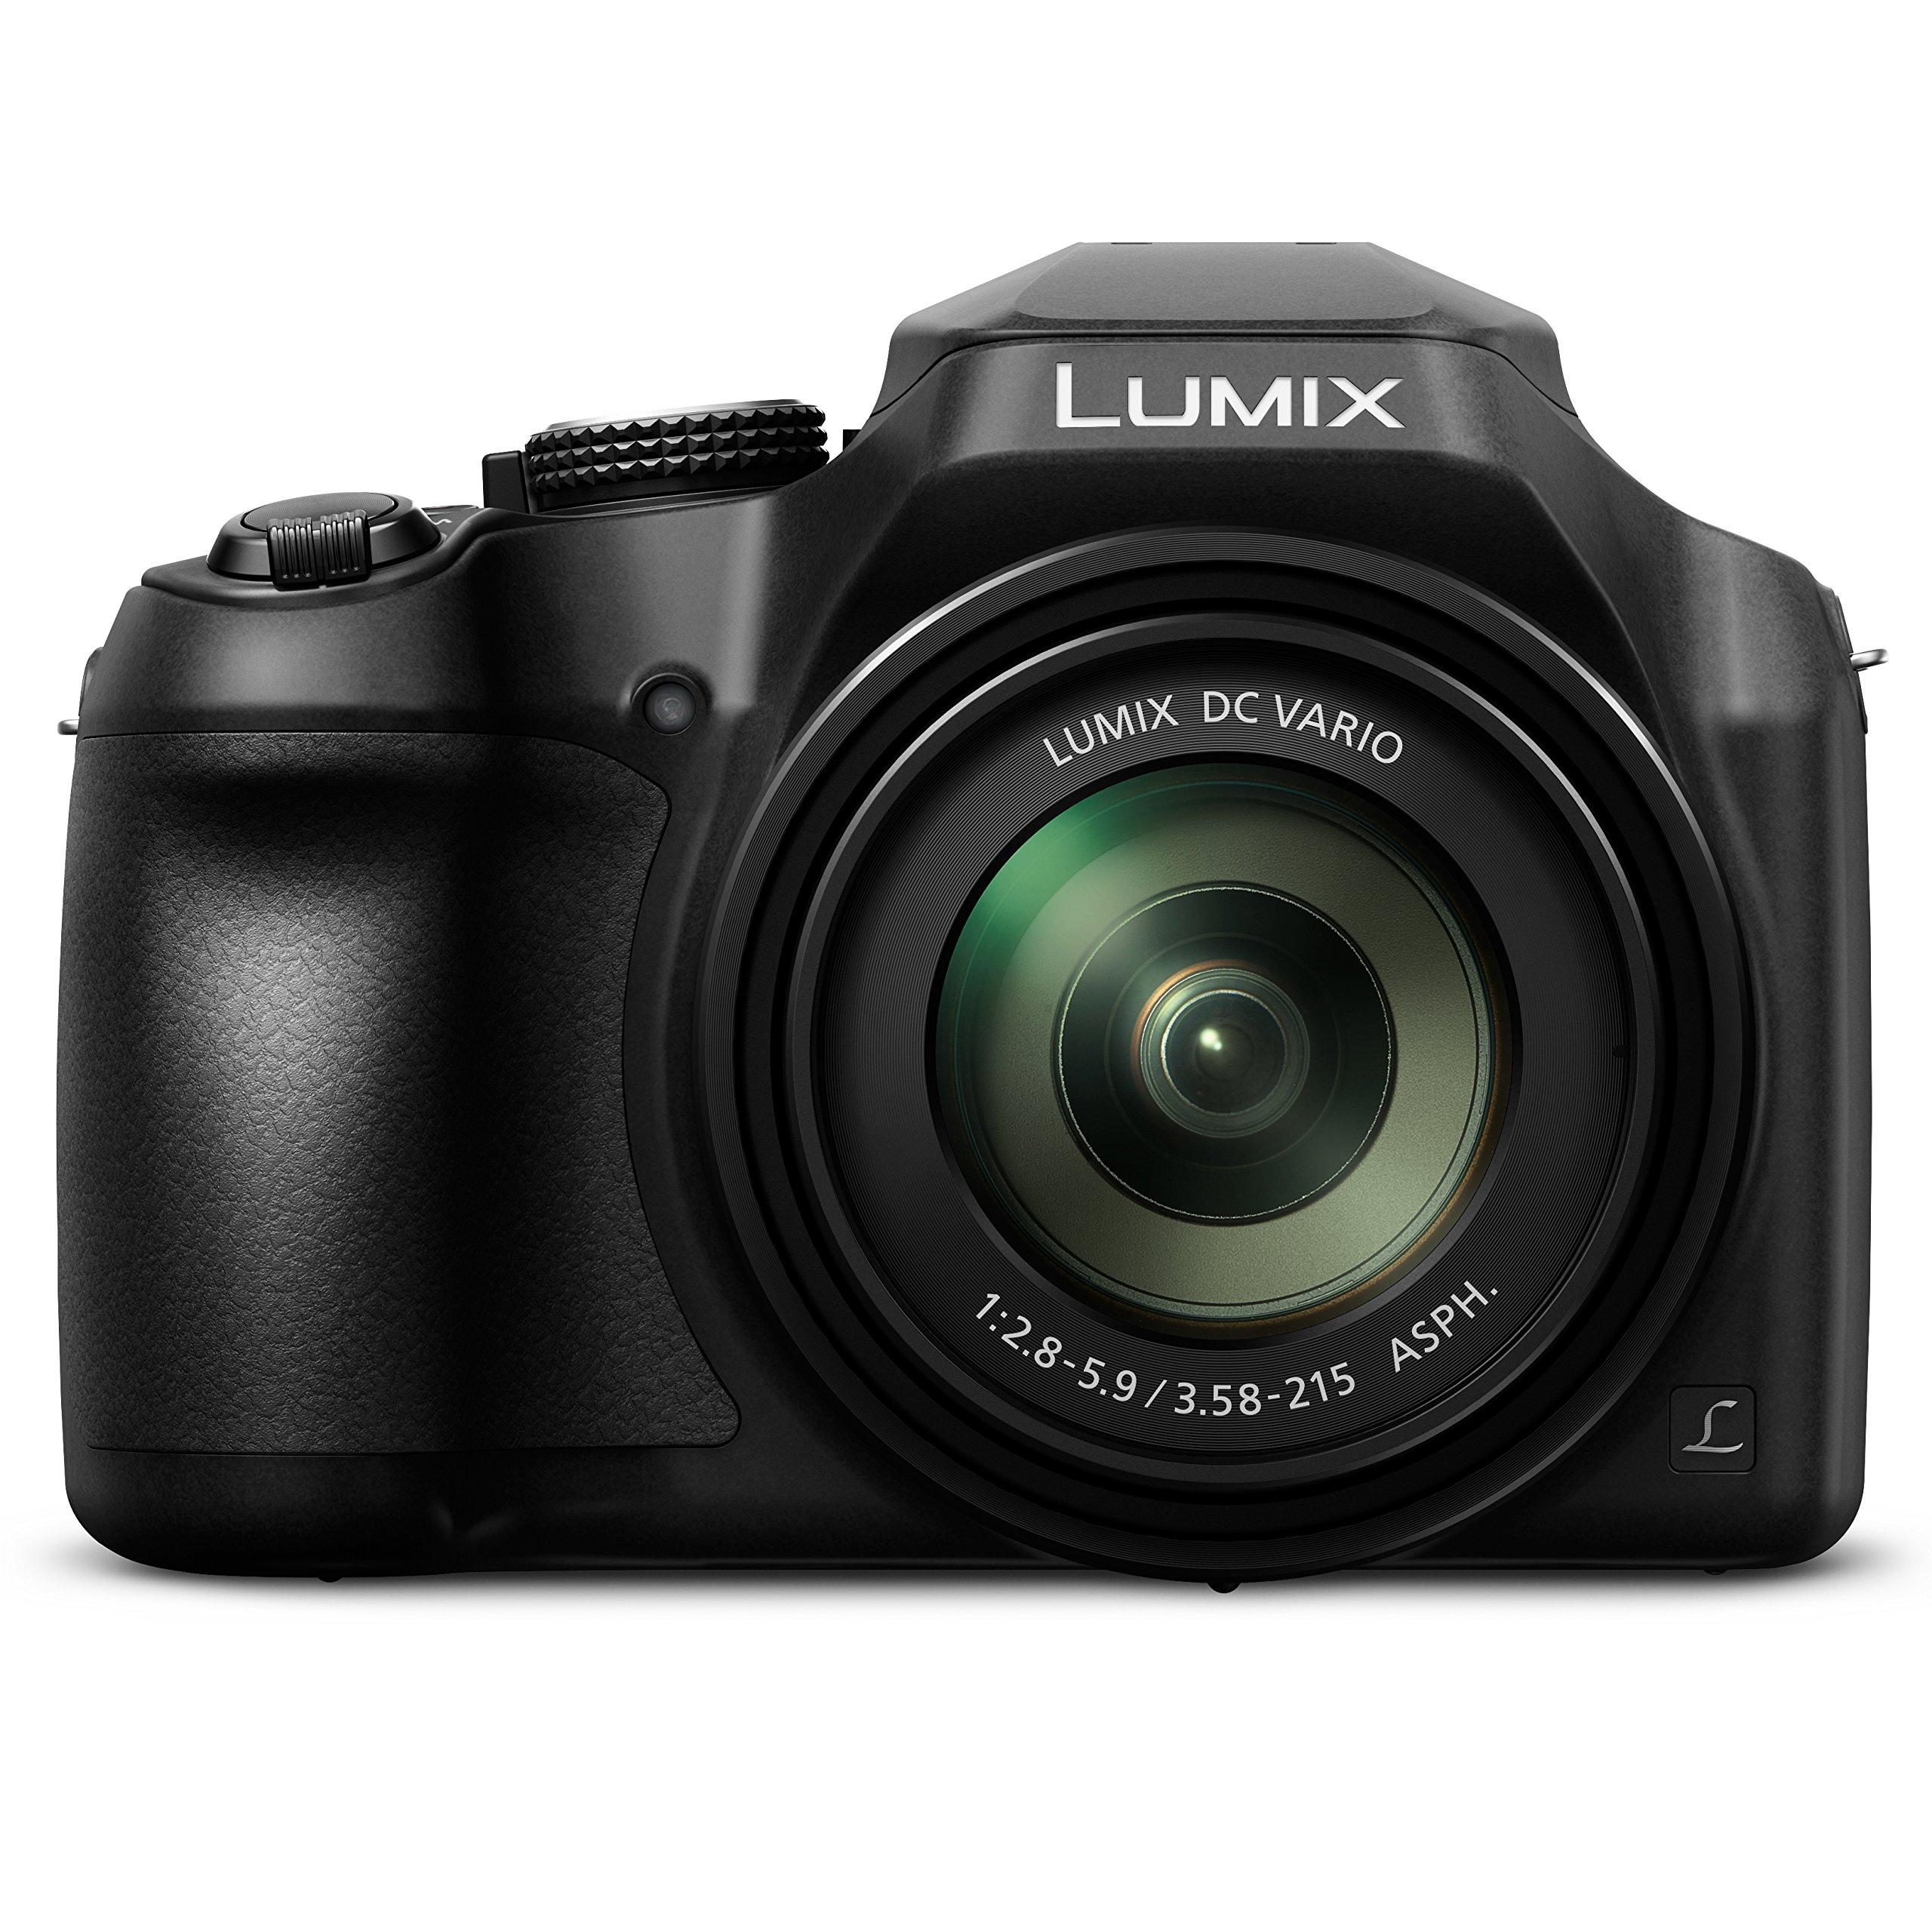 panasonic-lumix-fz80-4k-digital-camera-181-megapixel-video-camera-60x-zoom-dc-vario-20-1200mm-lens-f28-59-aperture-power-ois-stabilization-touch-enabled-3-inch-lcd-wi-fi-dc-fz80k